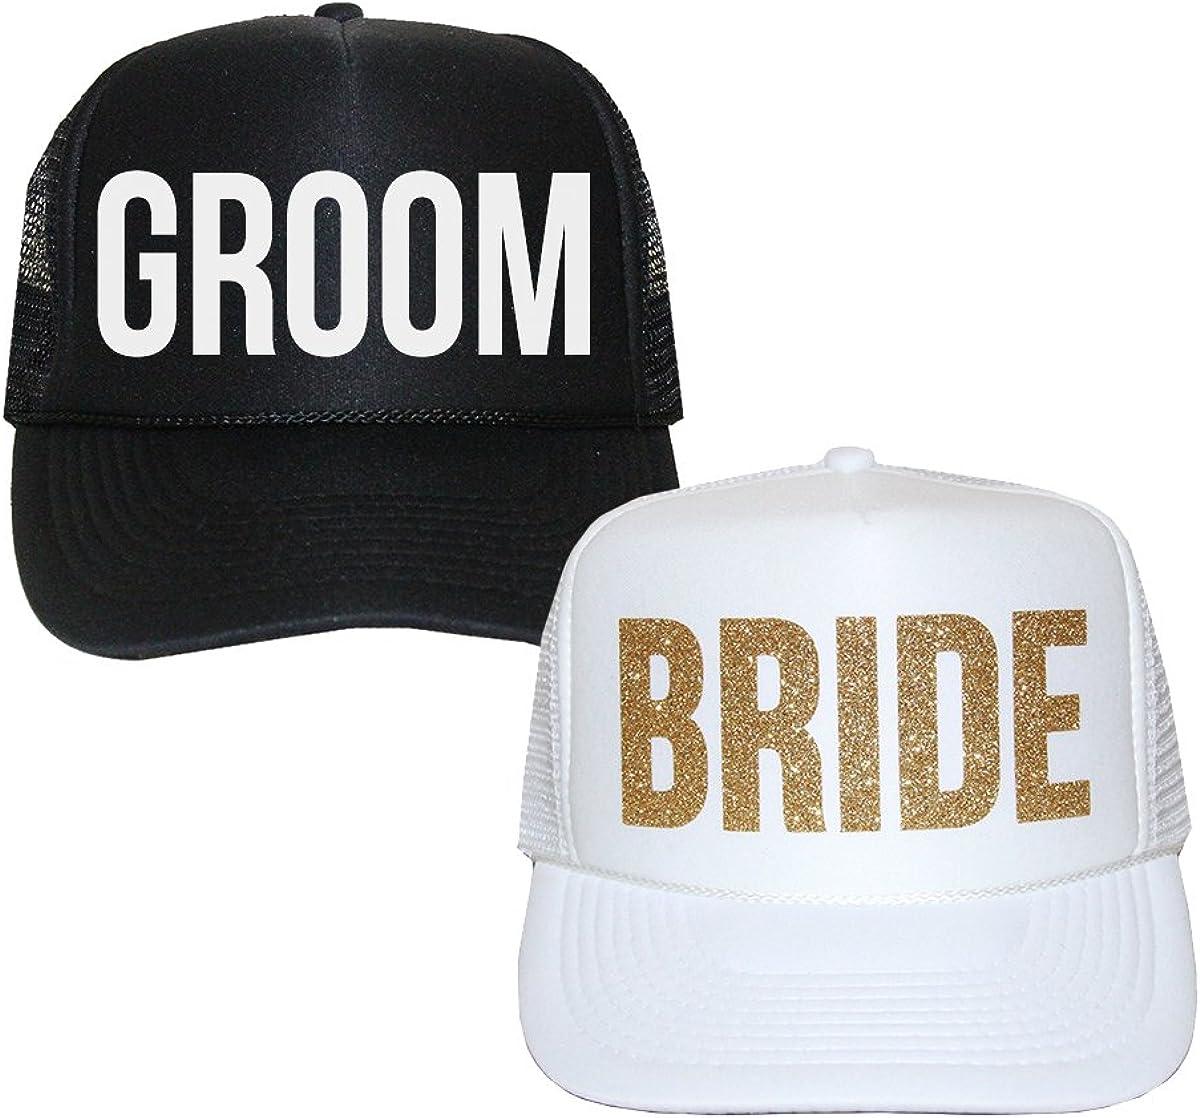 trucker cap wedding trucker hat Bride hat Newlywed hat JUST MARRIED Trucker hats Hats for the Bride Black /& Gold Bride trucker hat